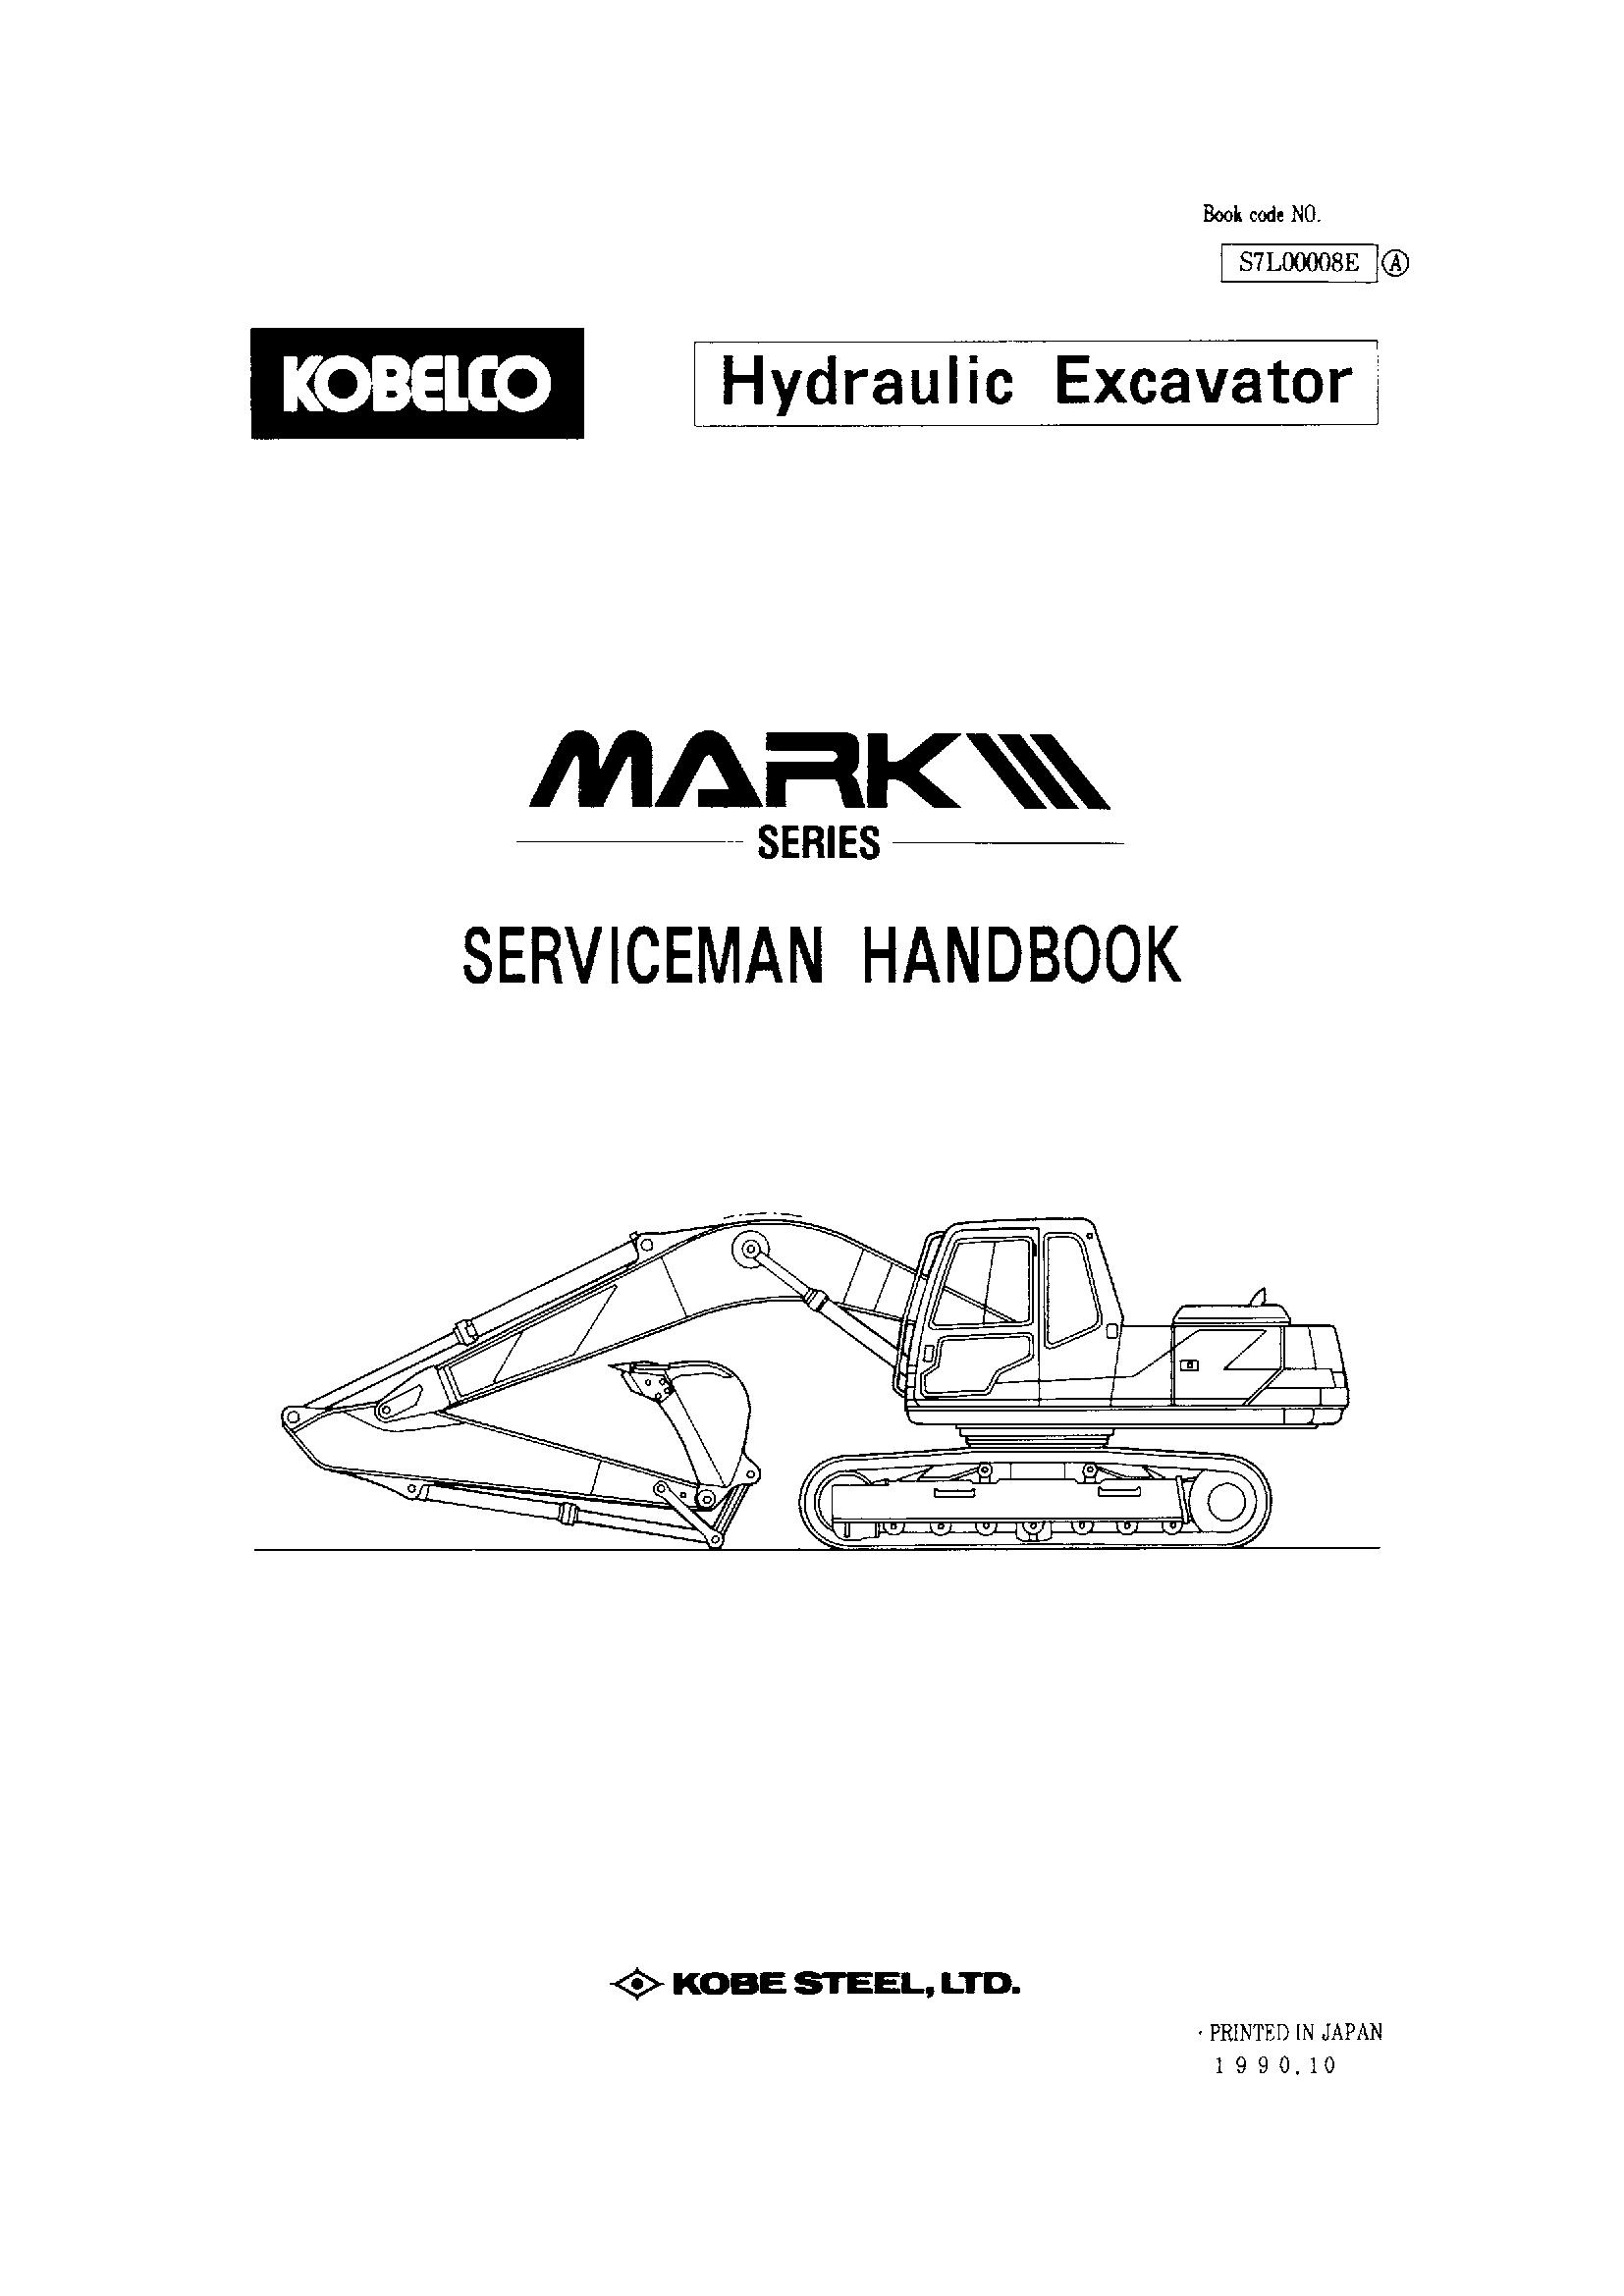 Kobelco Manuals: Kobelco SK115DZ MARK IV HYDRAULIC